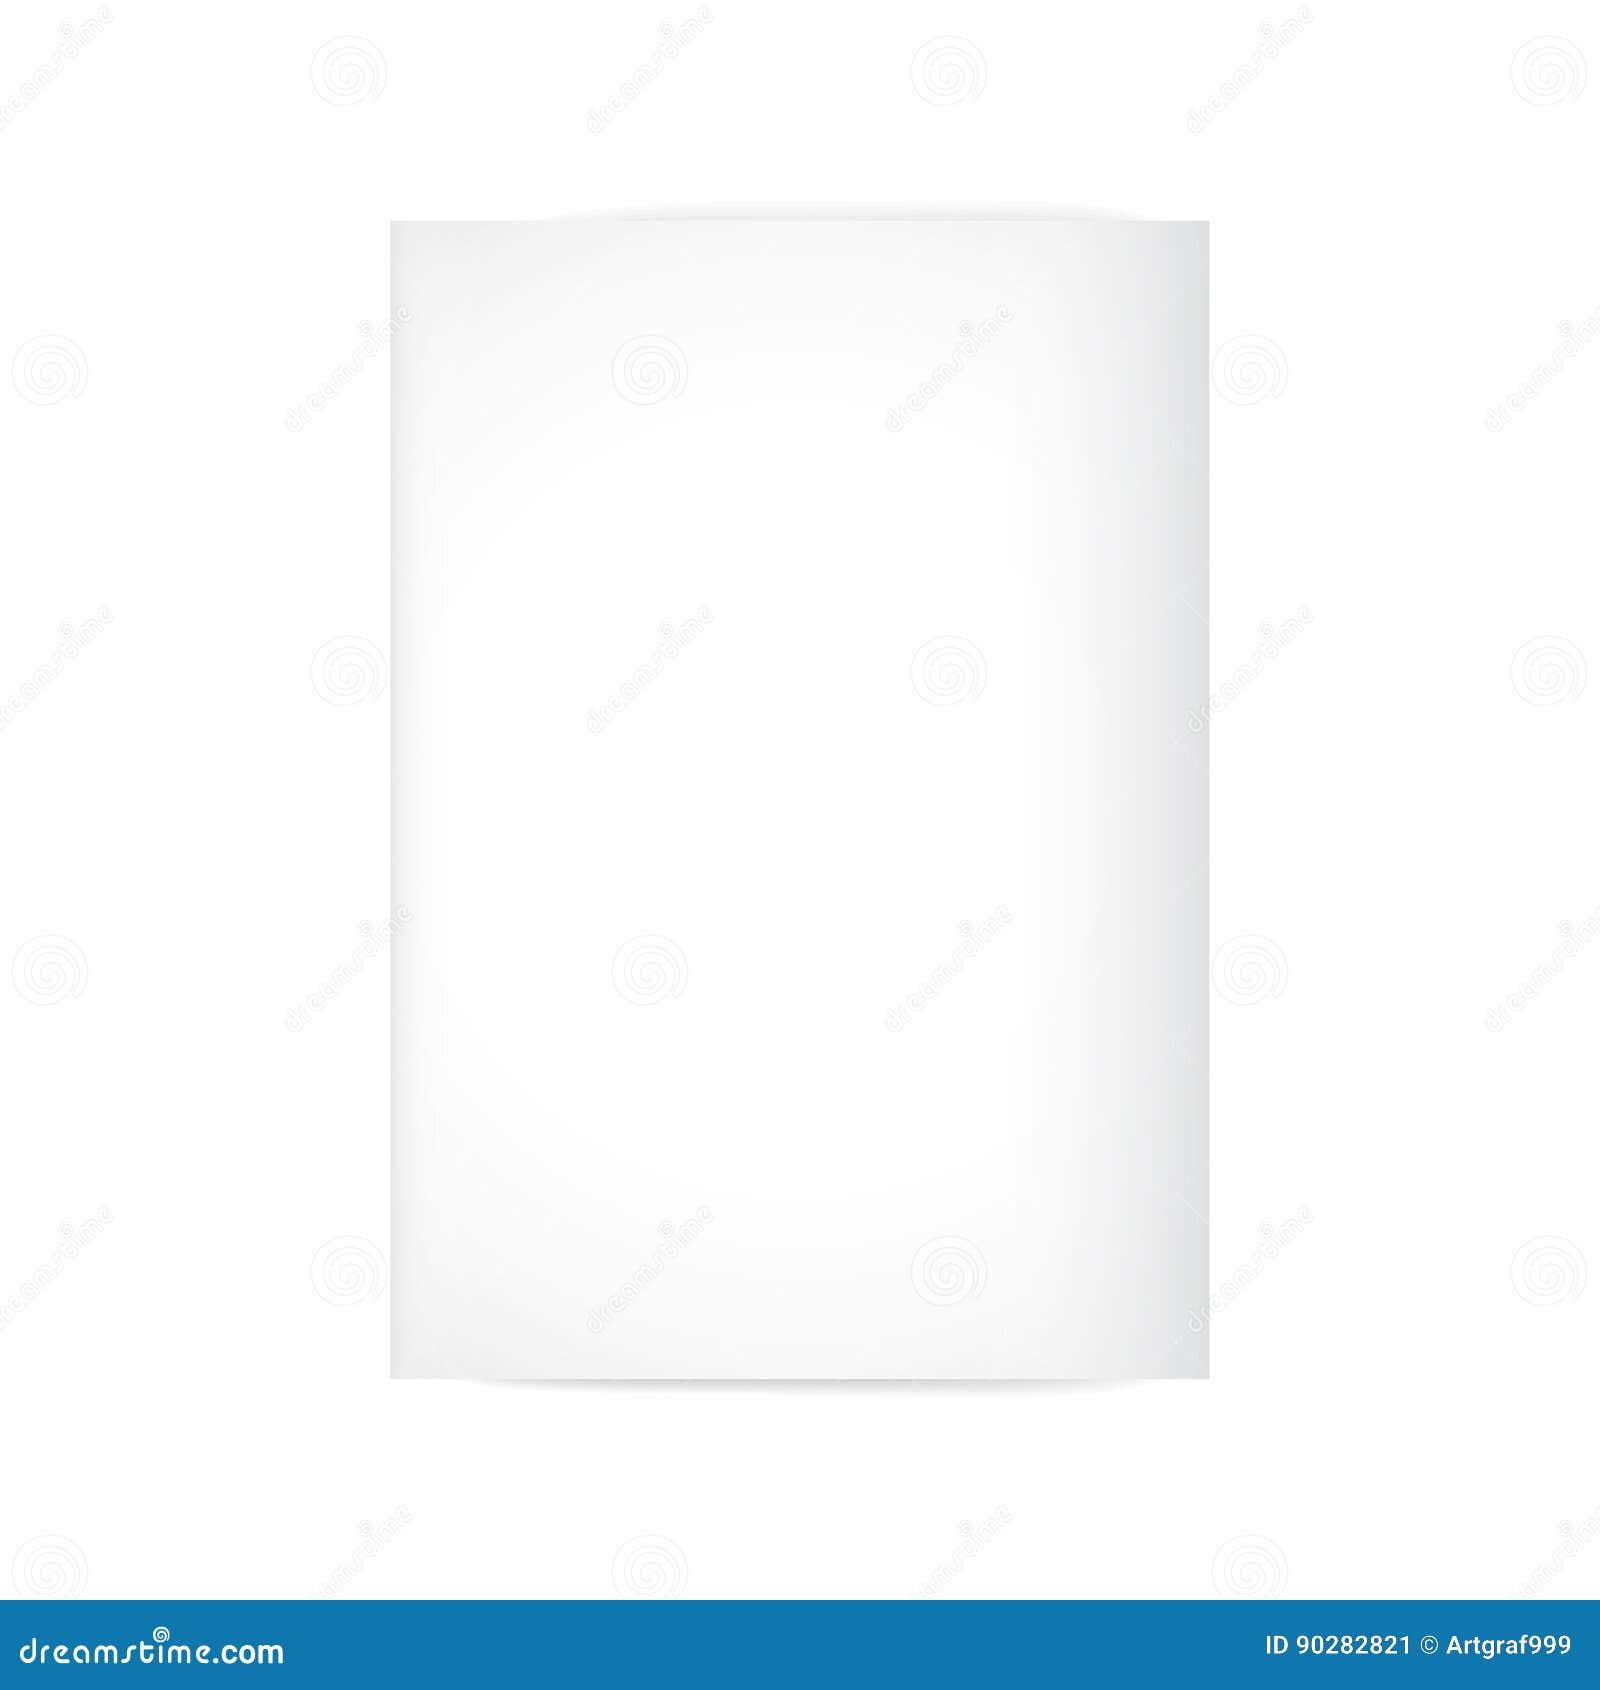 Papierspott oben